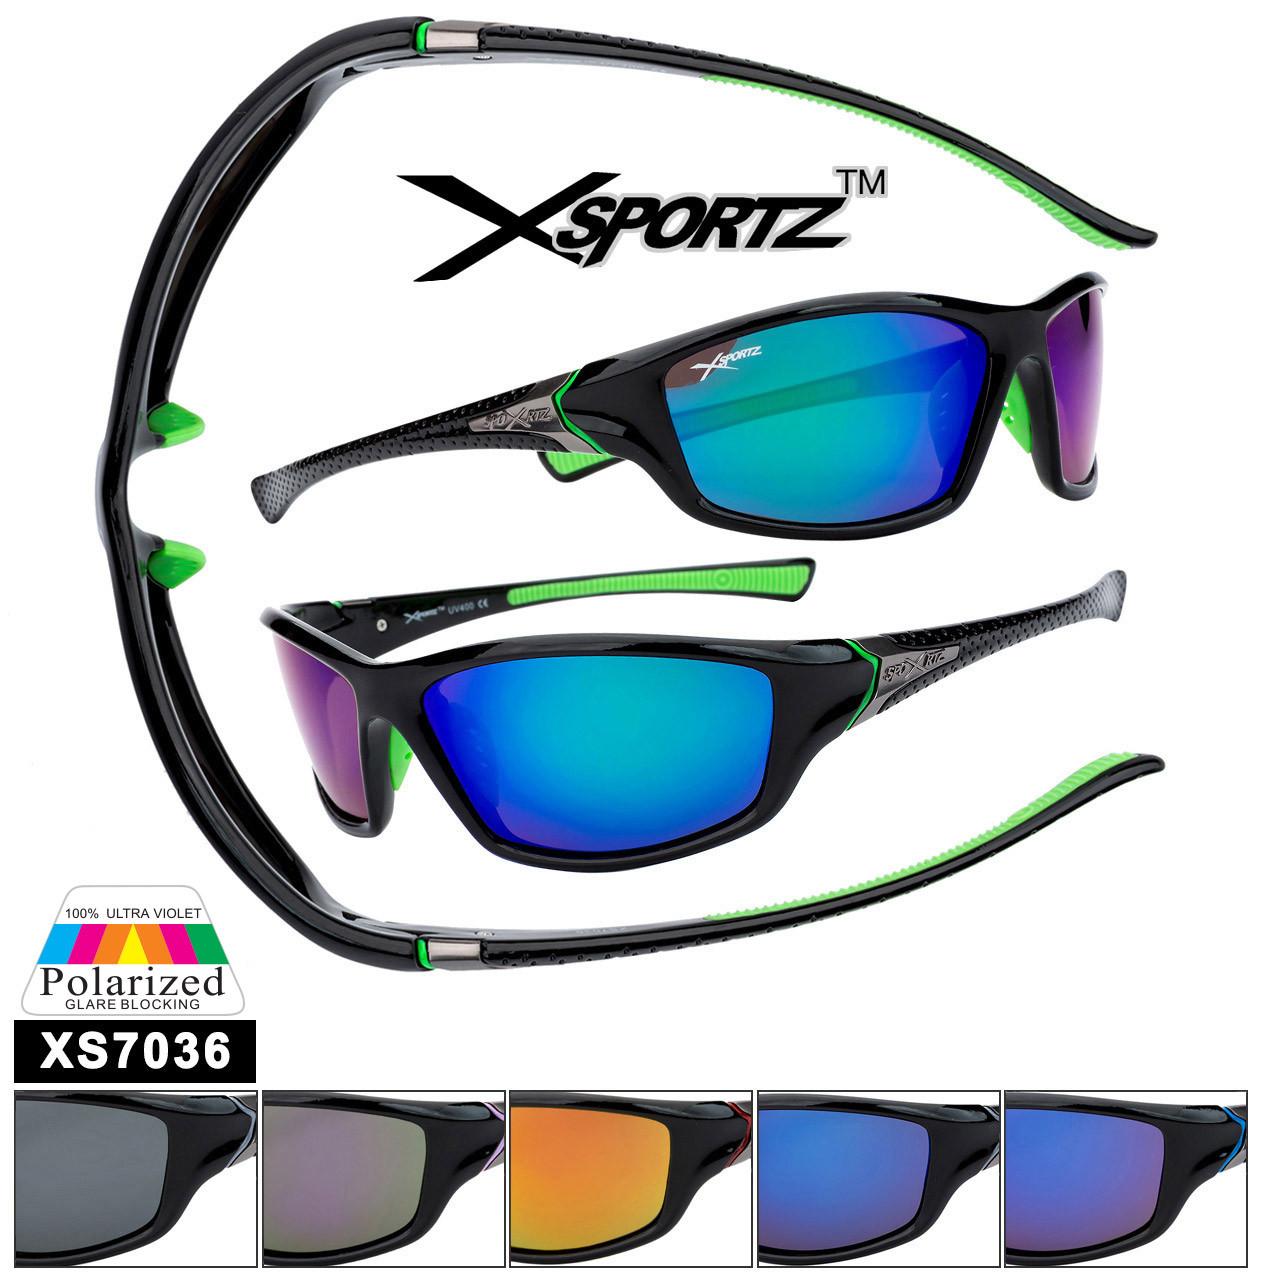 Bulk Polarized Xsportz™ Sports Sunglasses XS7036